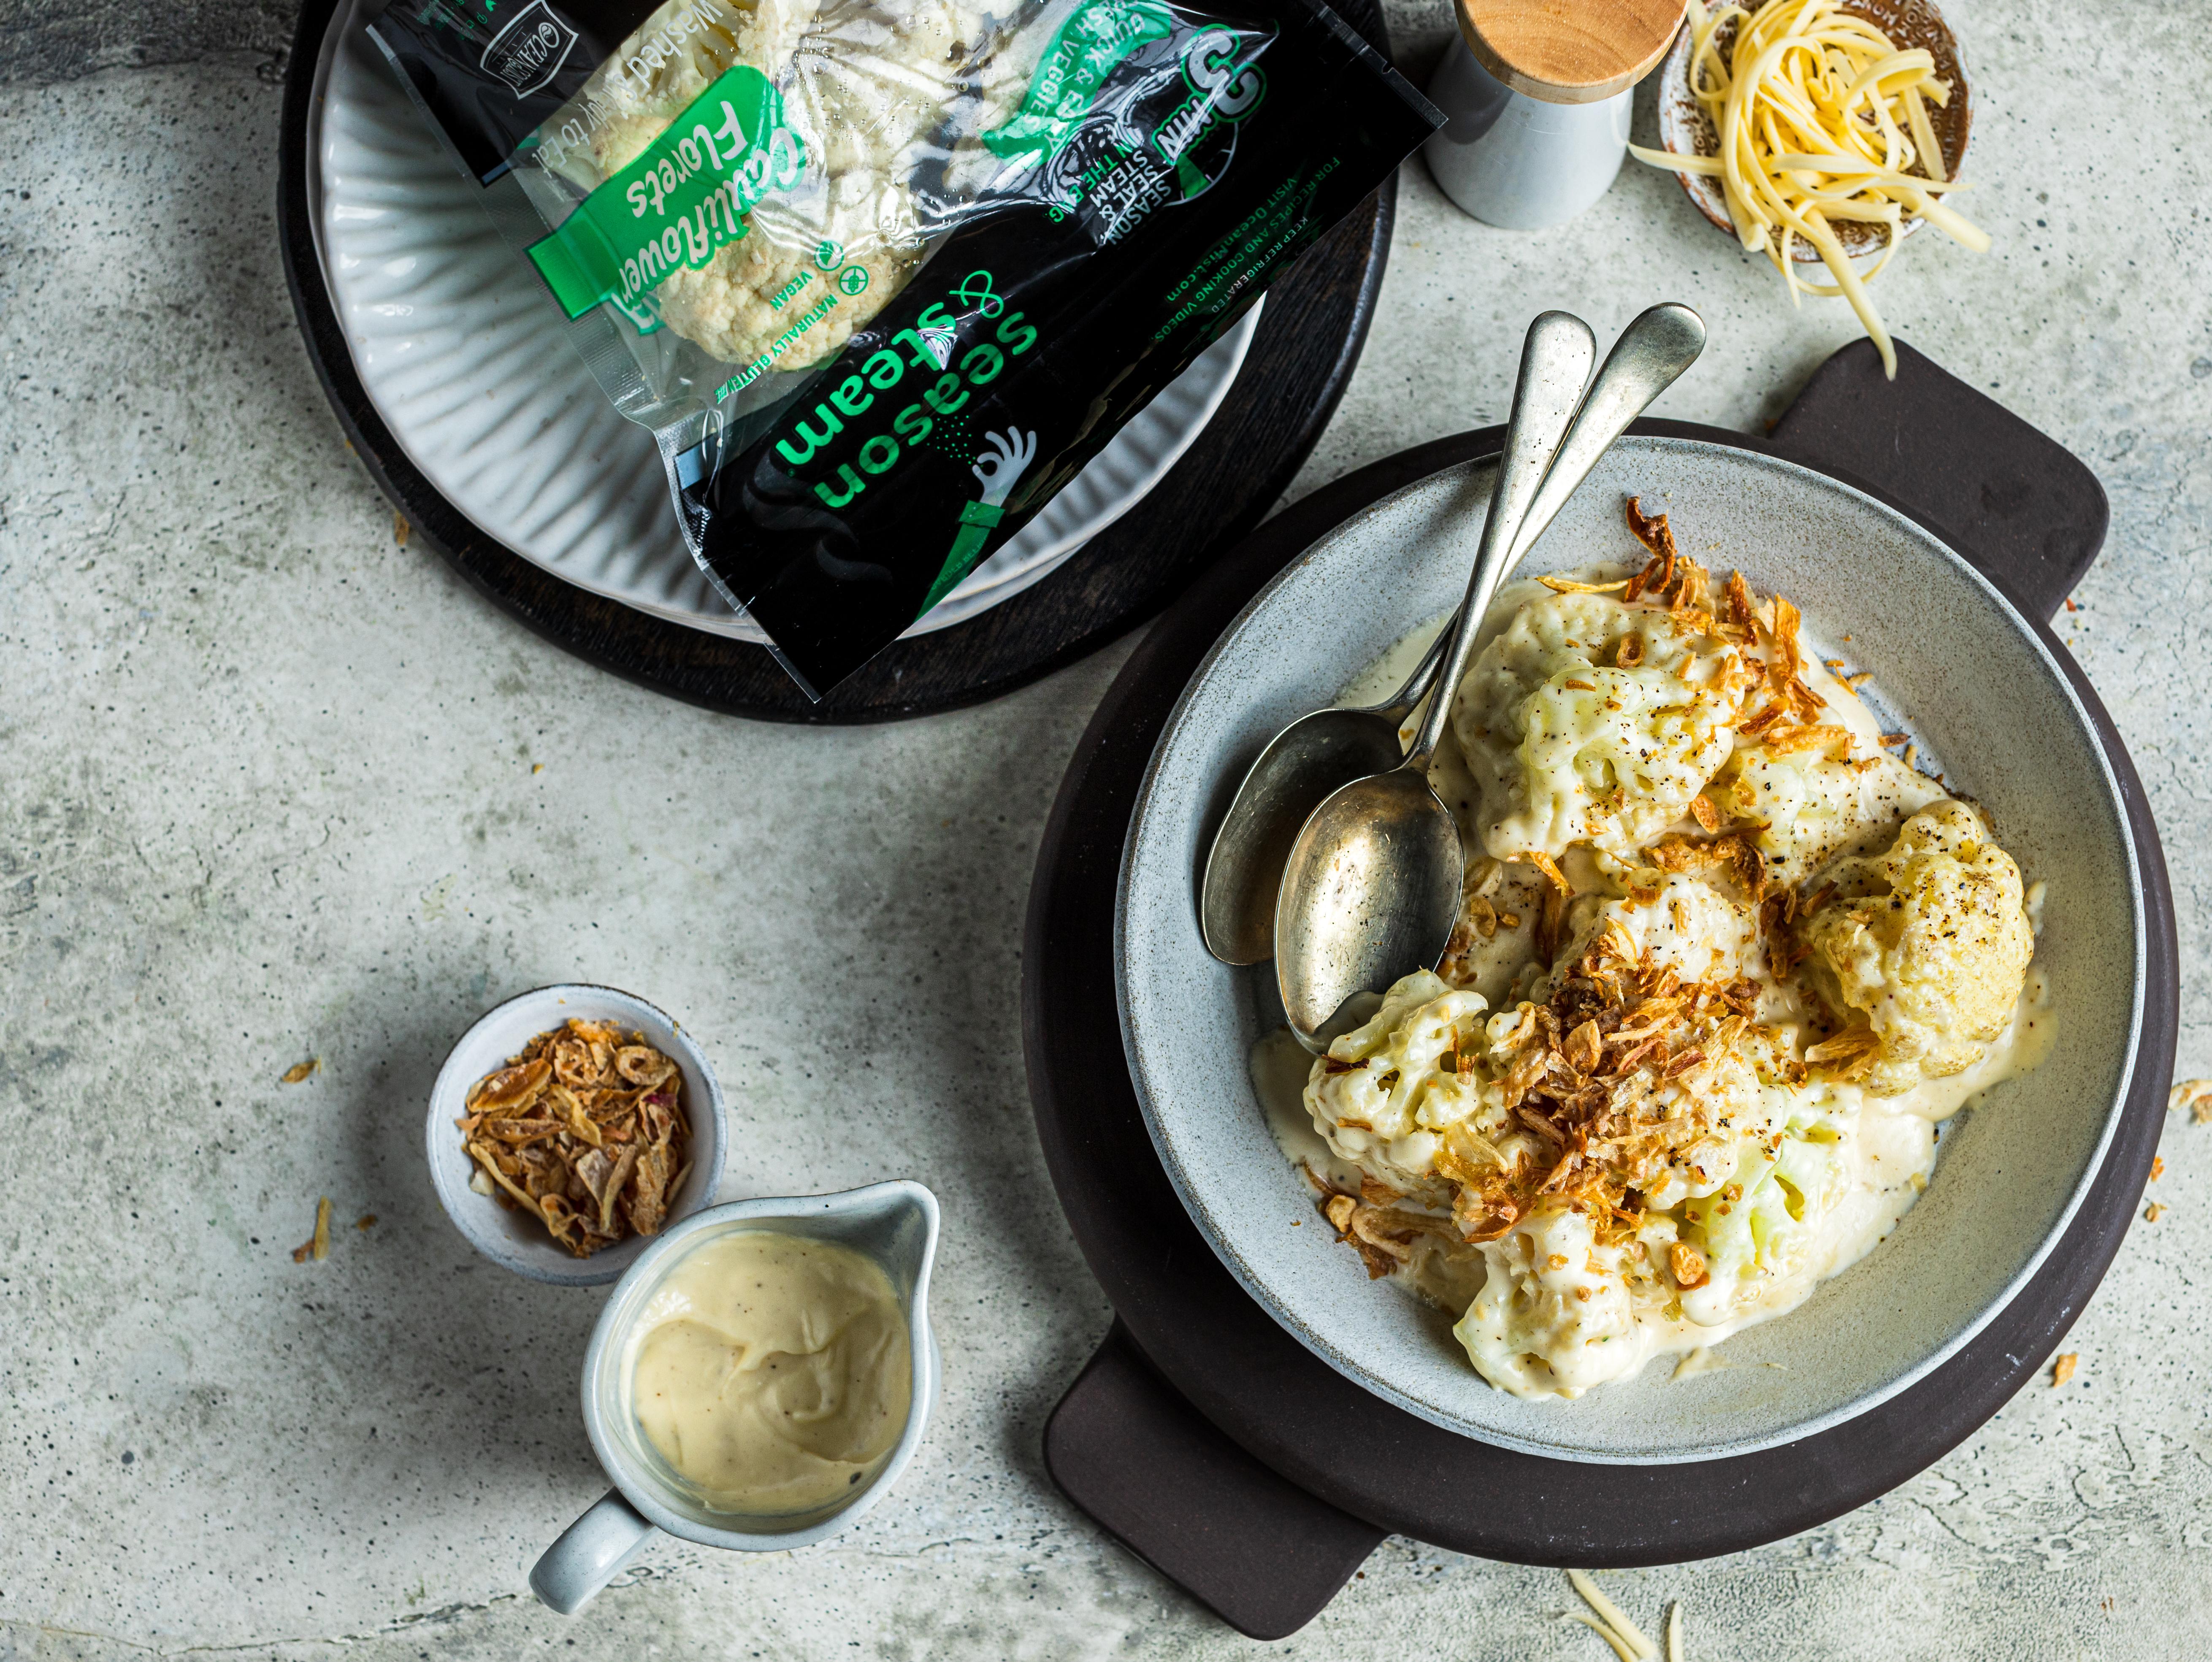 Creamy Gouda Cauliflower Gratin